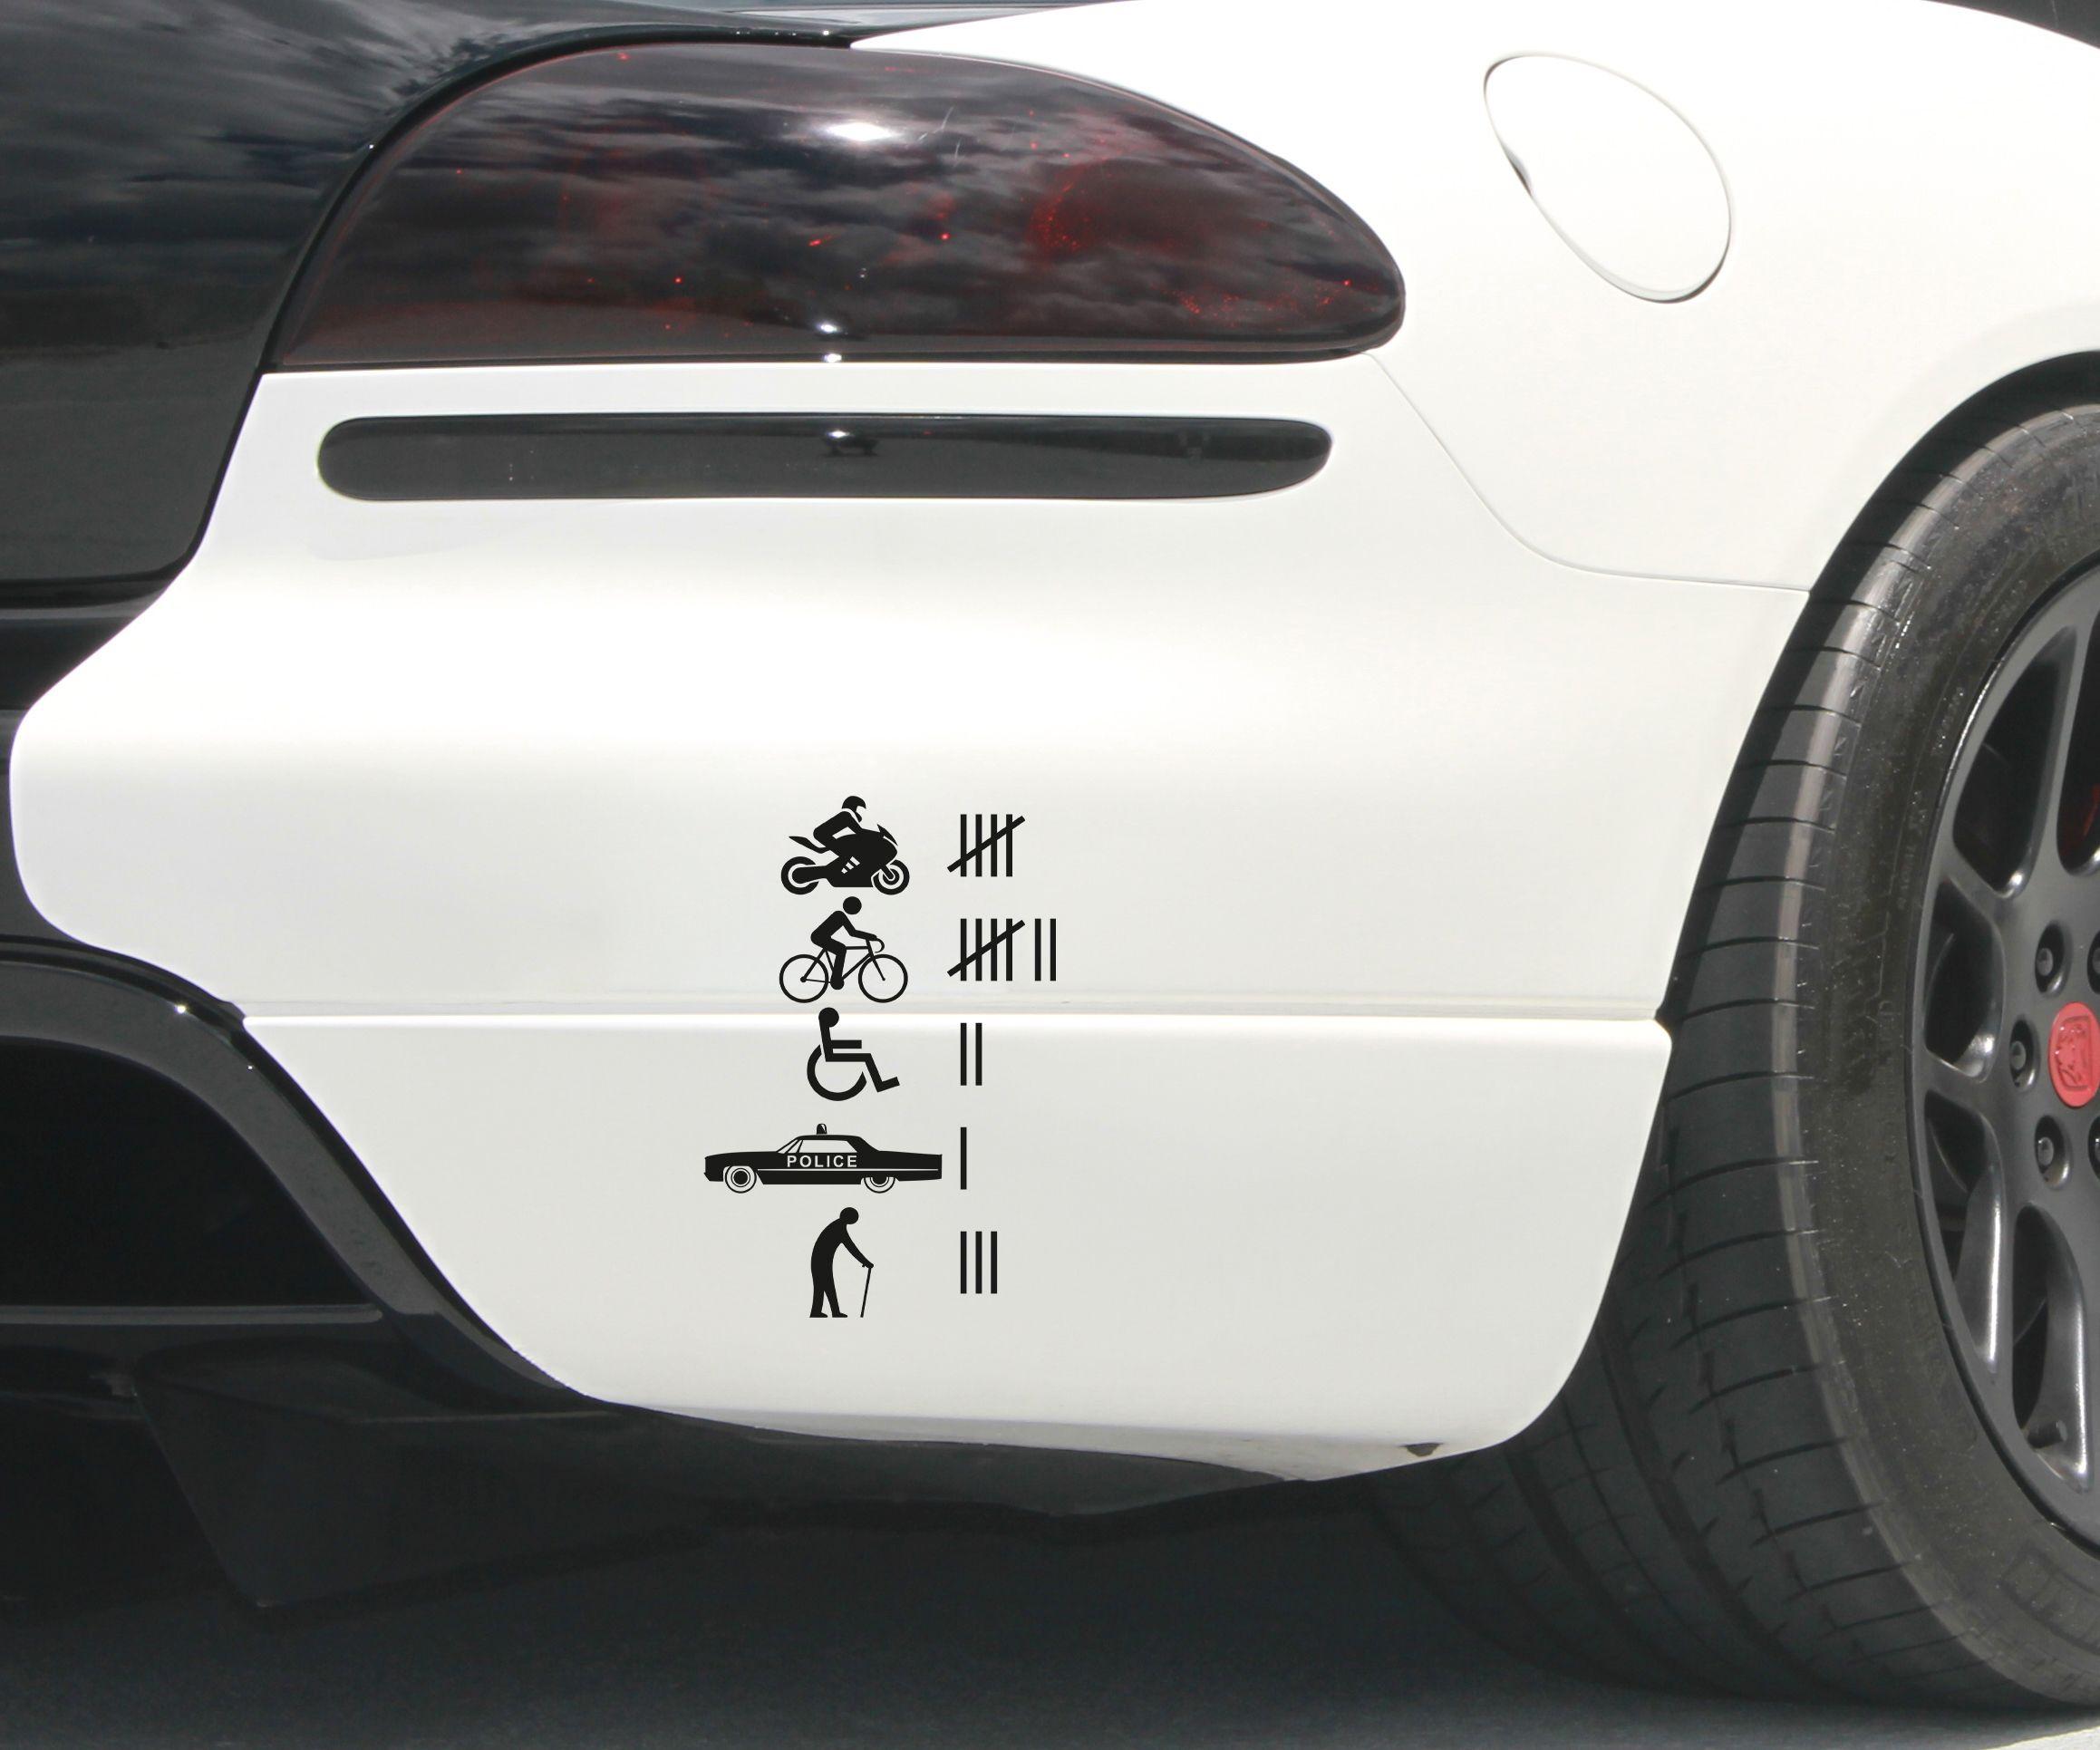 Car window sticker designs - Joke Accident Count Funny Prank Hit Jdm Hoonigan Car Window Vinyl Sticker Decal